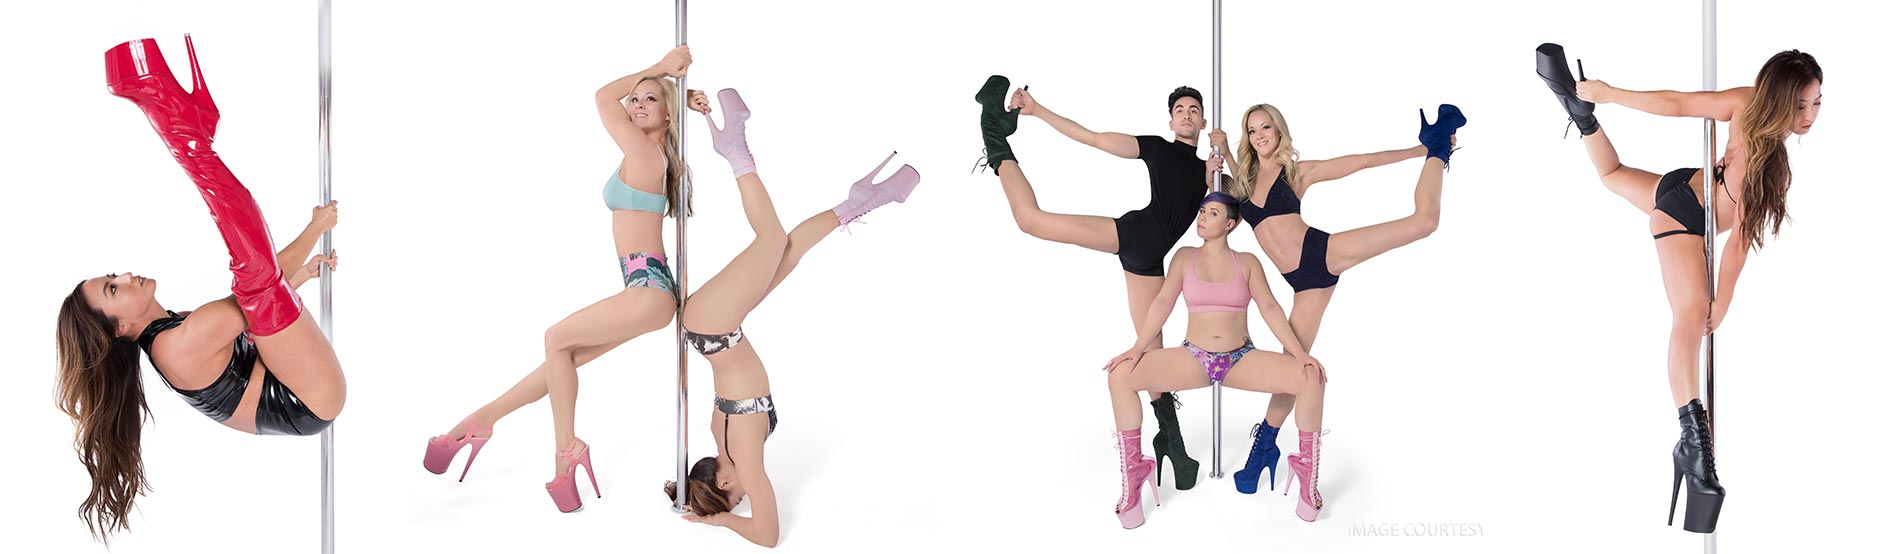 Quality Poledance Heels by Pleaser